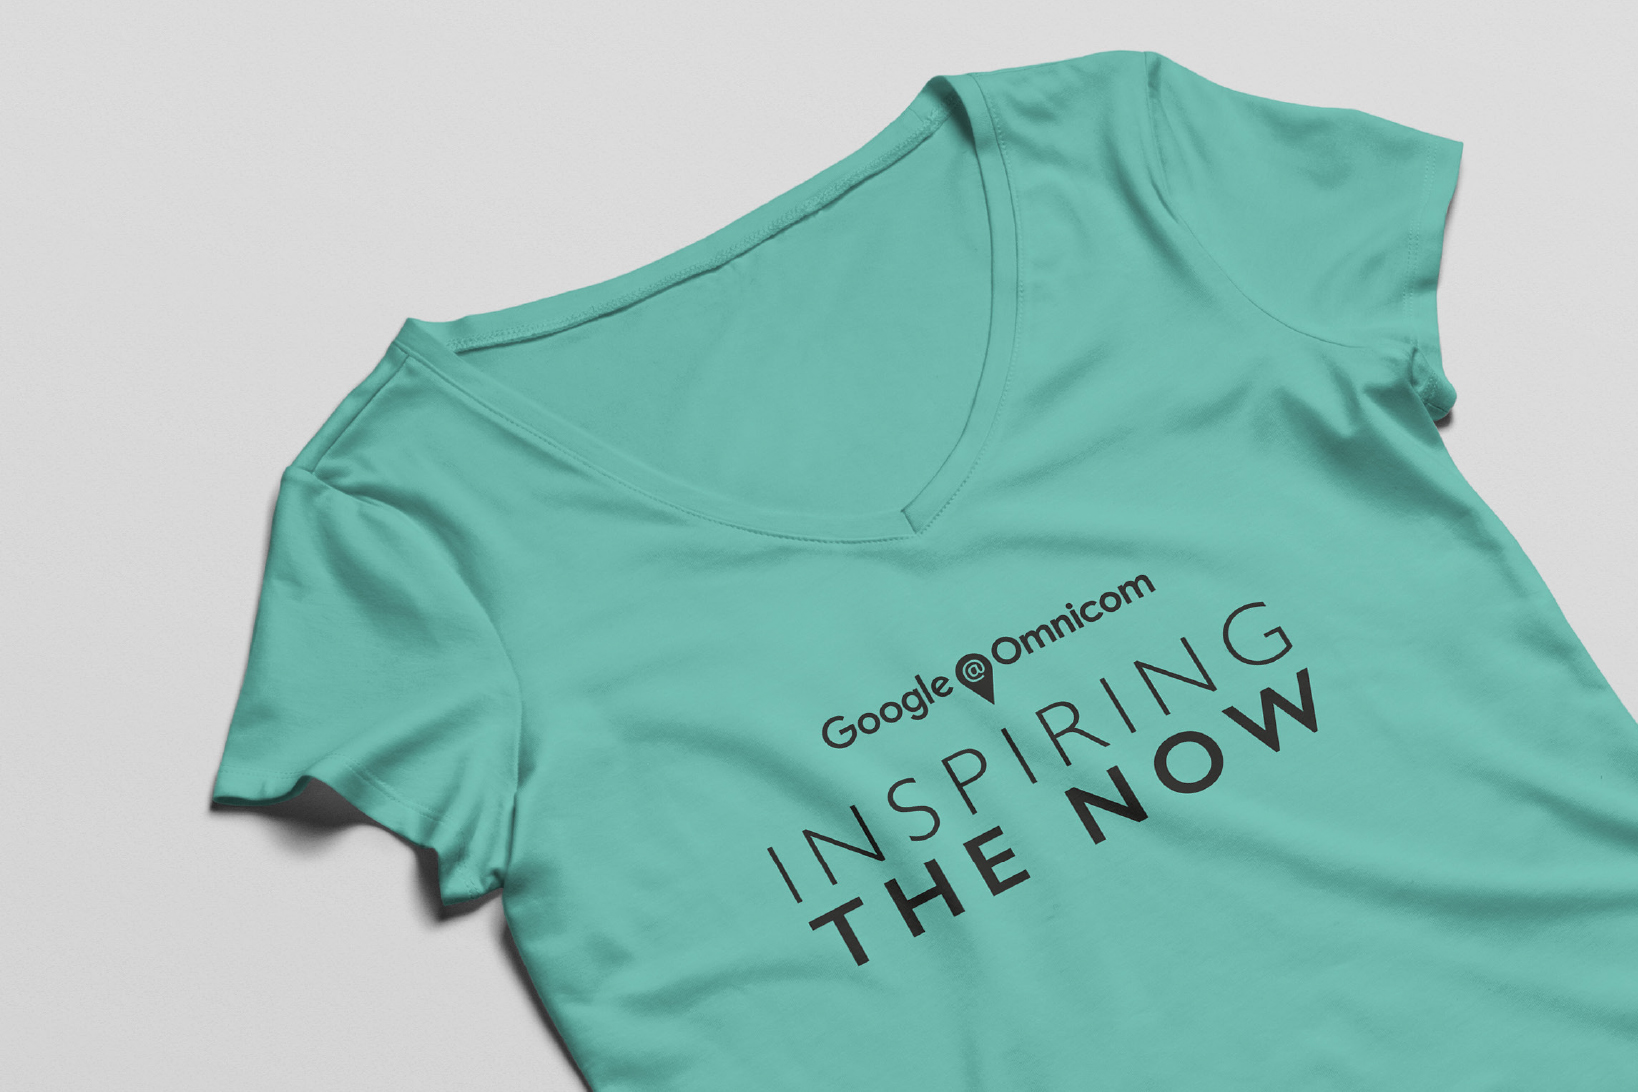 Google t shirt.jpg